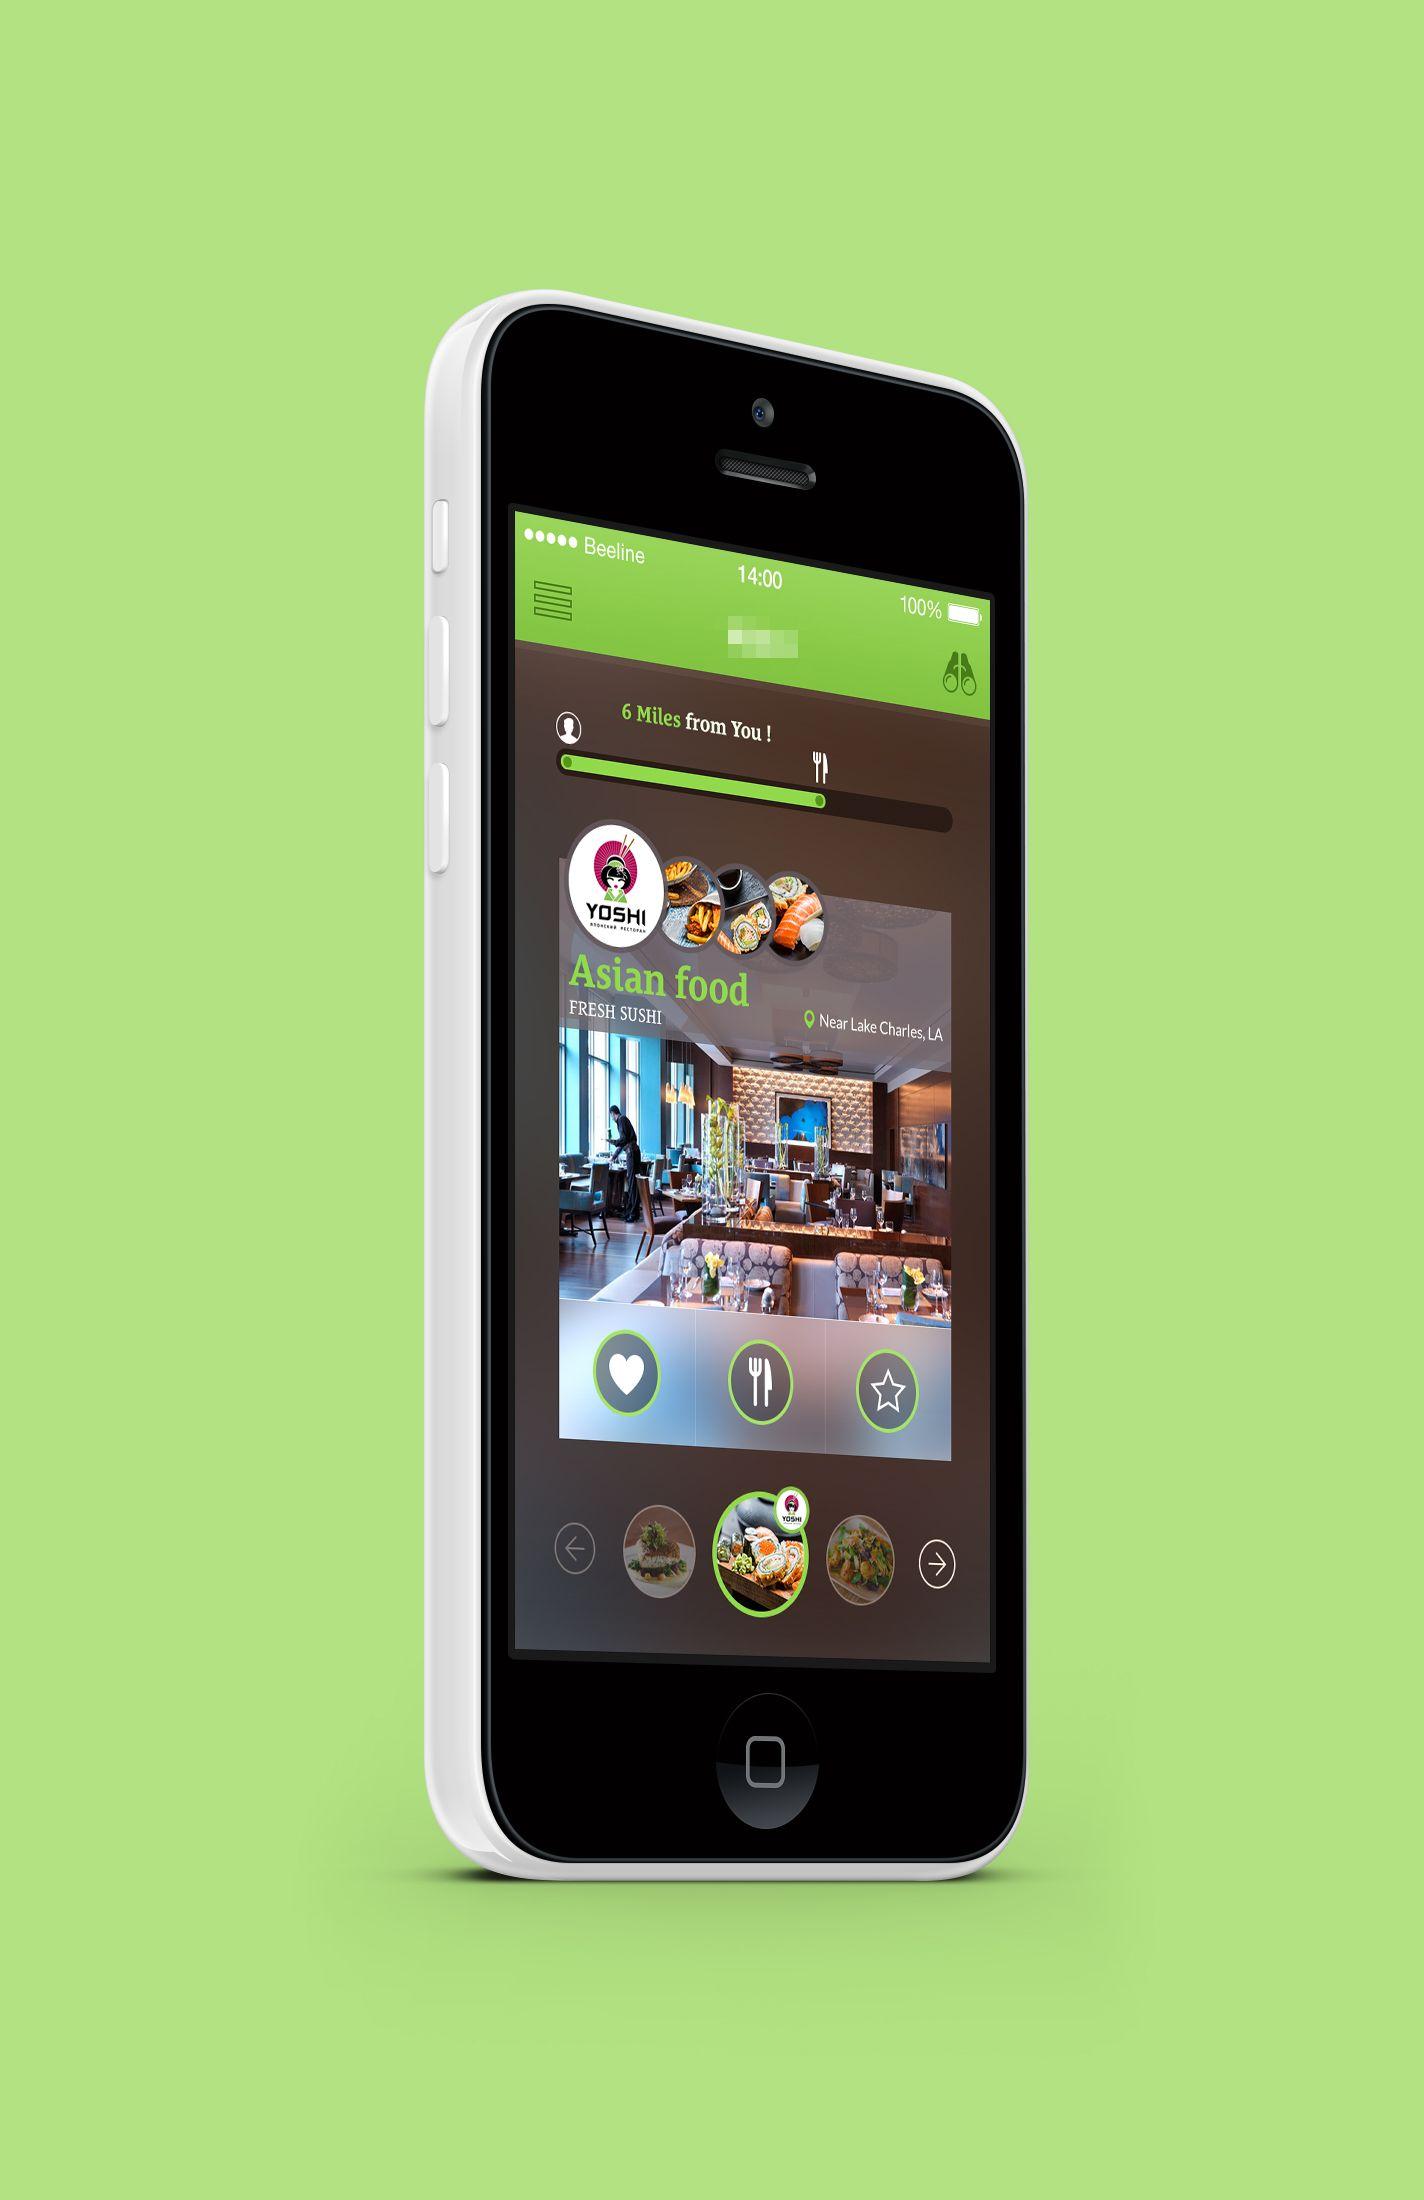 Restaurant_app_big Restaurant app, App, Restaurant